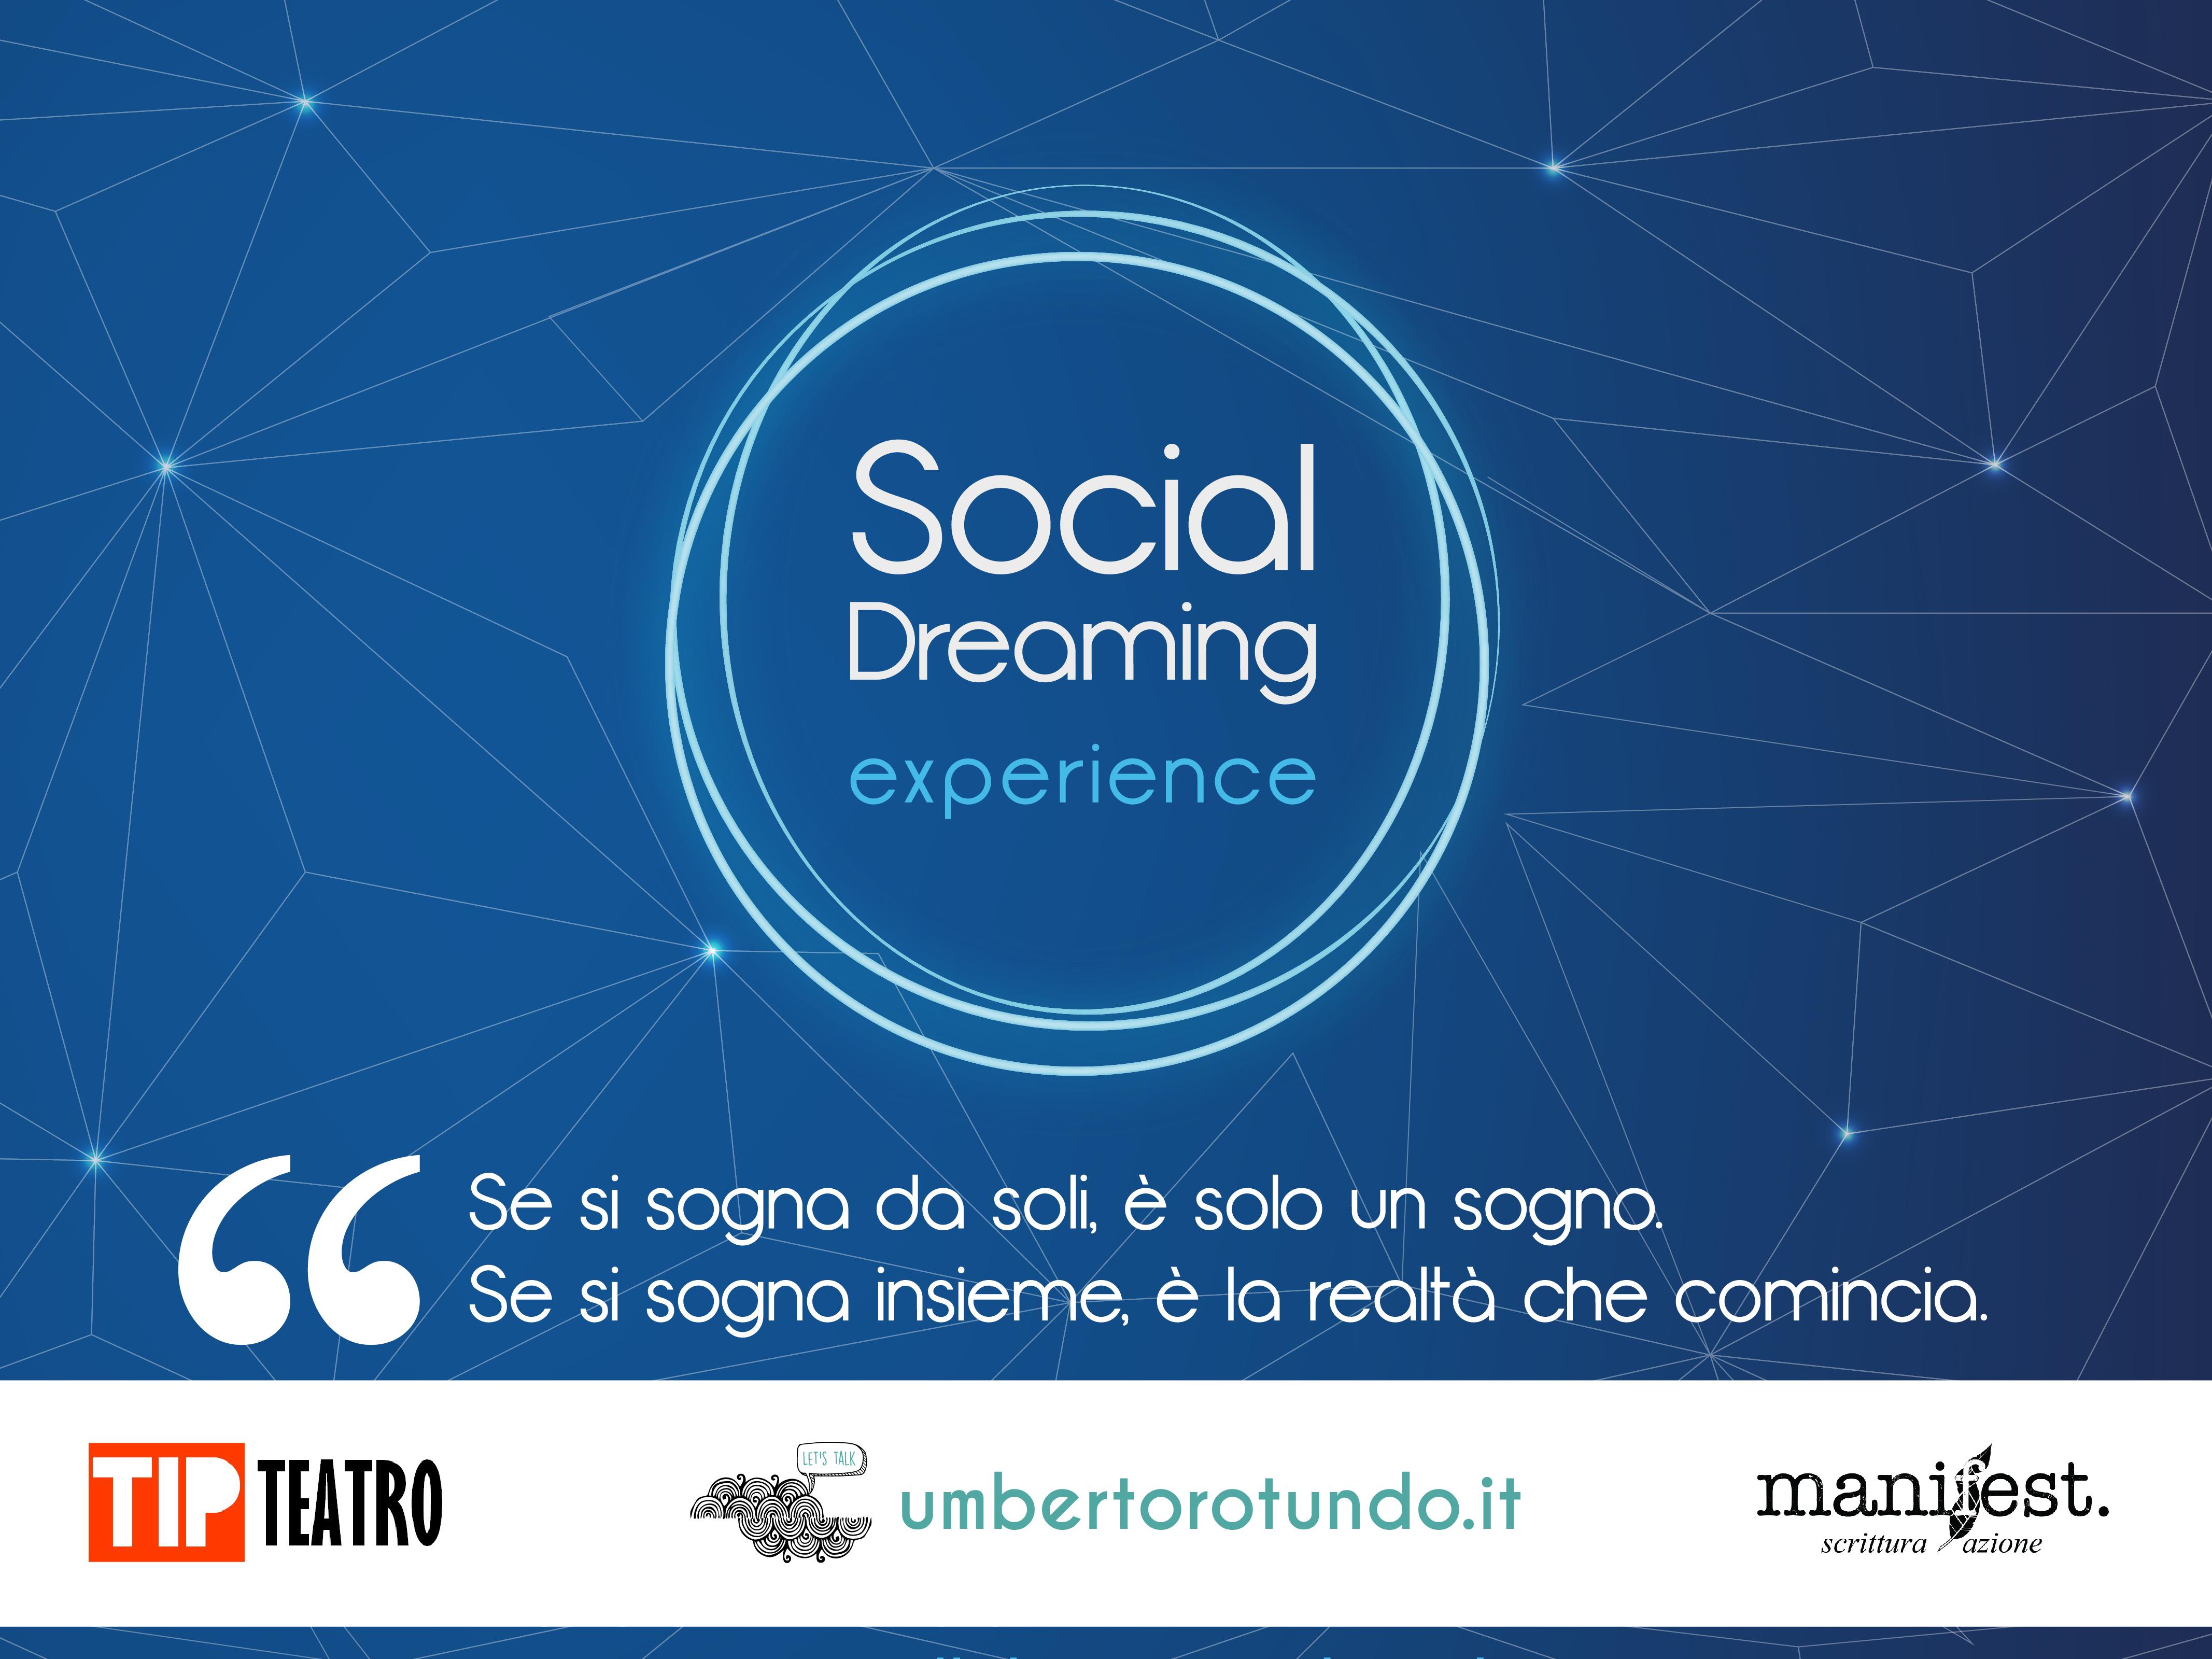 Il 27 ottobre primo social dreaming experience al TIP Teatro Lamezia Terme